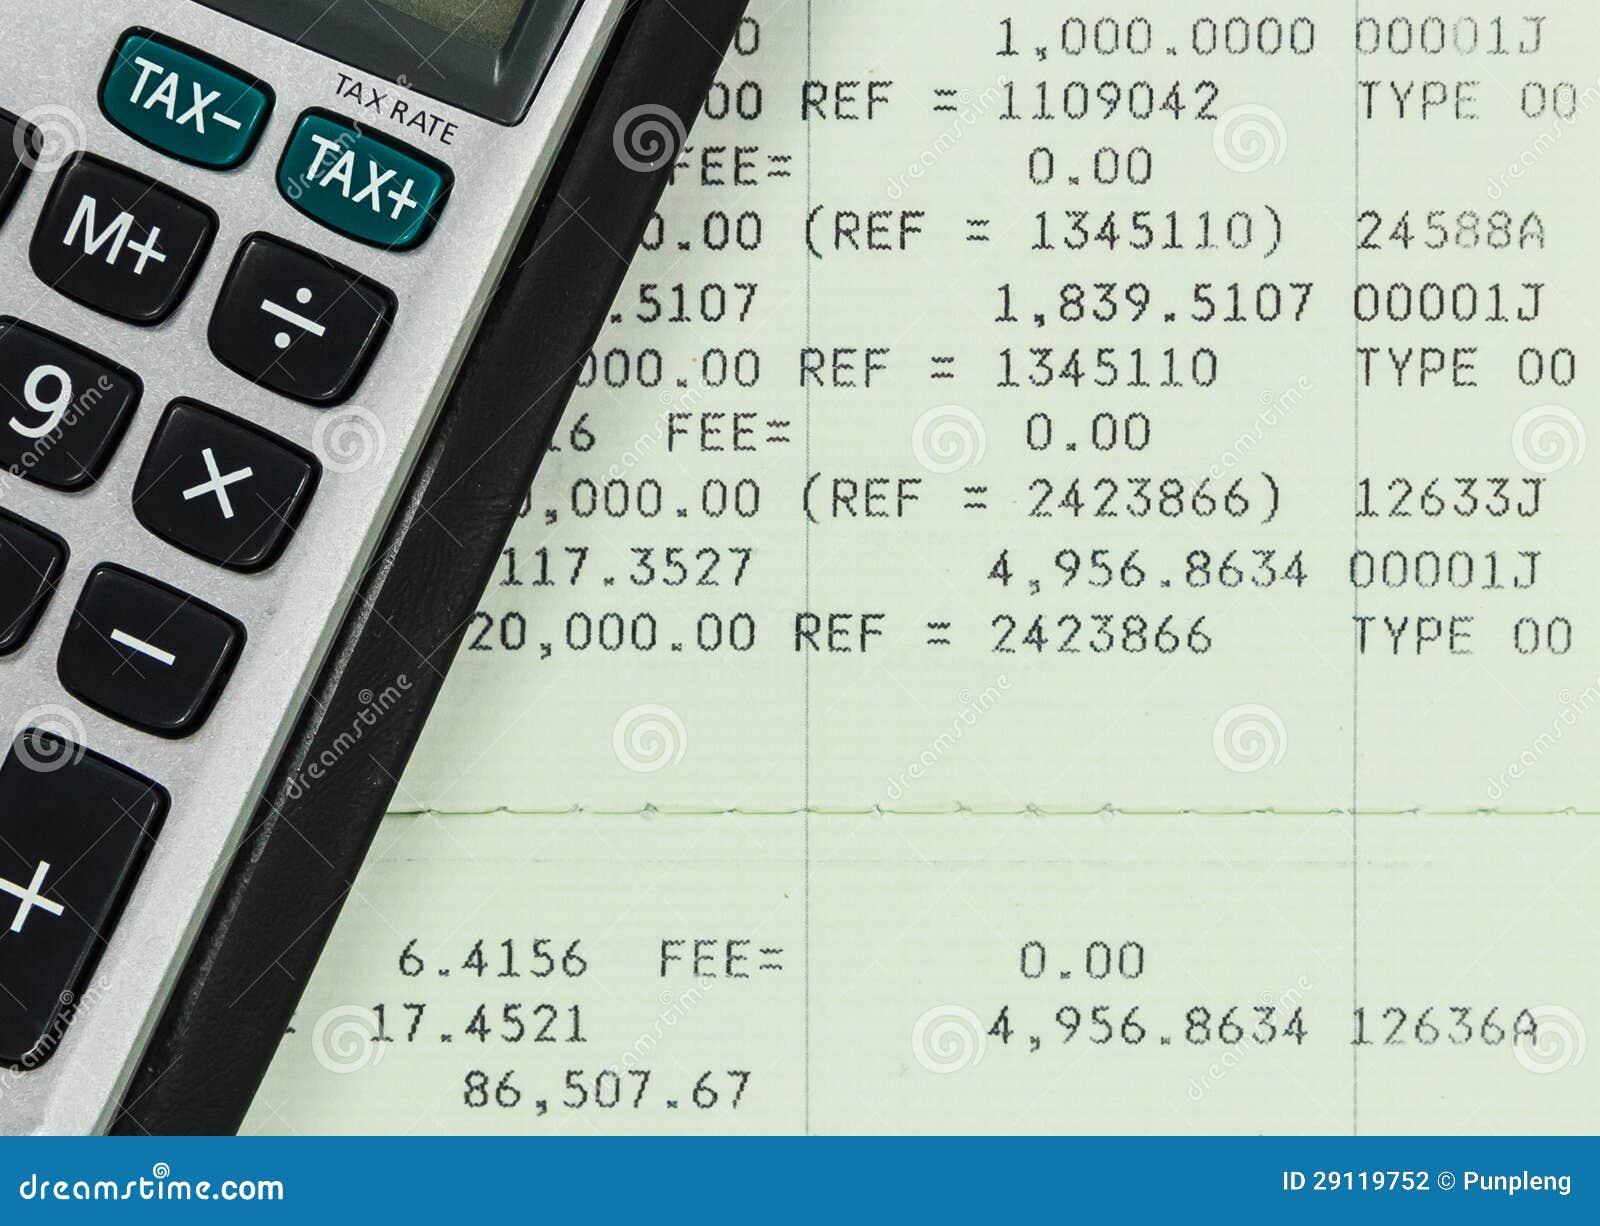 Photo license fee calculator - Royalty Free Stock Photo